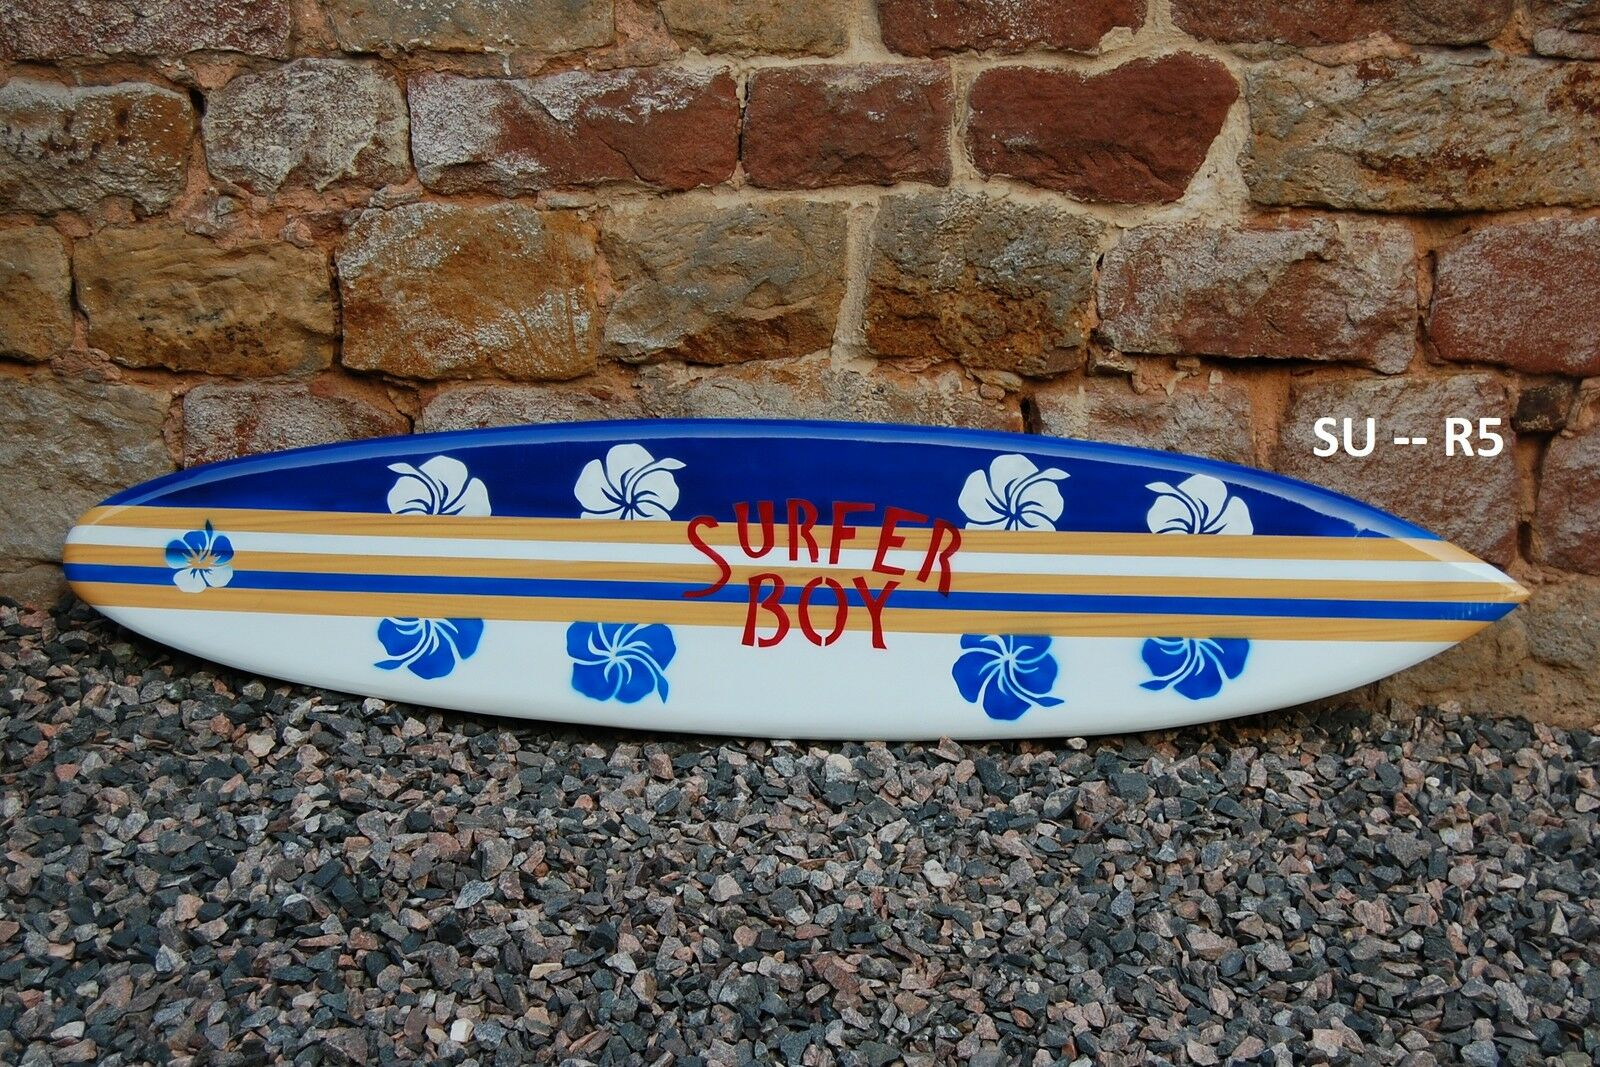 MODEL WOOD 100cm SURFBOARD PAINTED BOTH SIDES blueE SURFER BOY HIBISCUS su100R5D